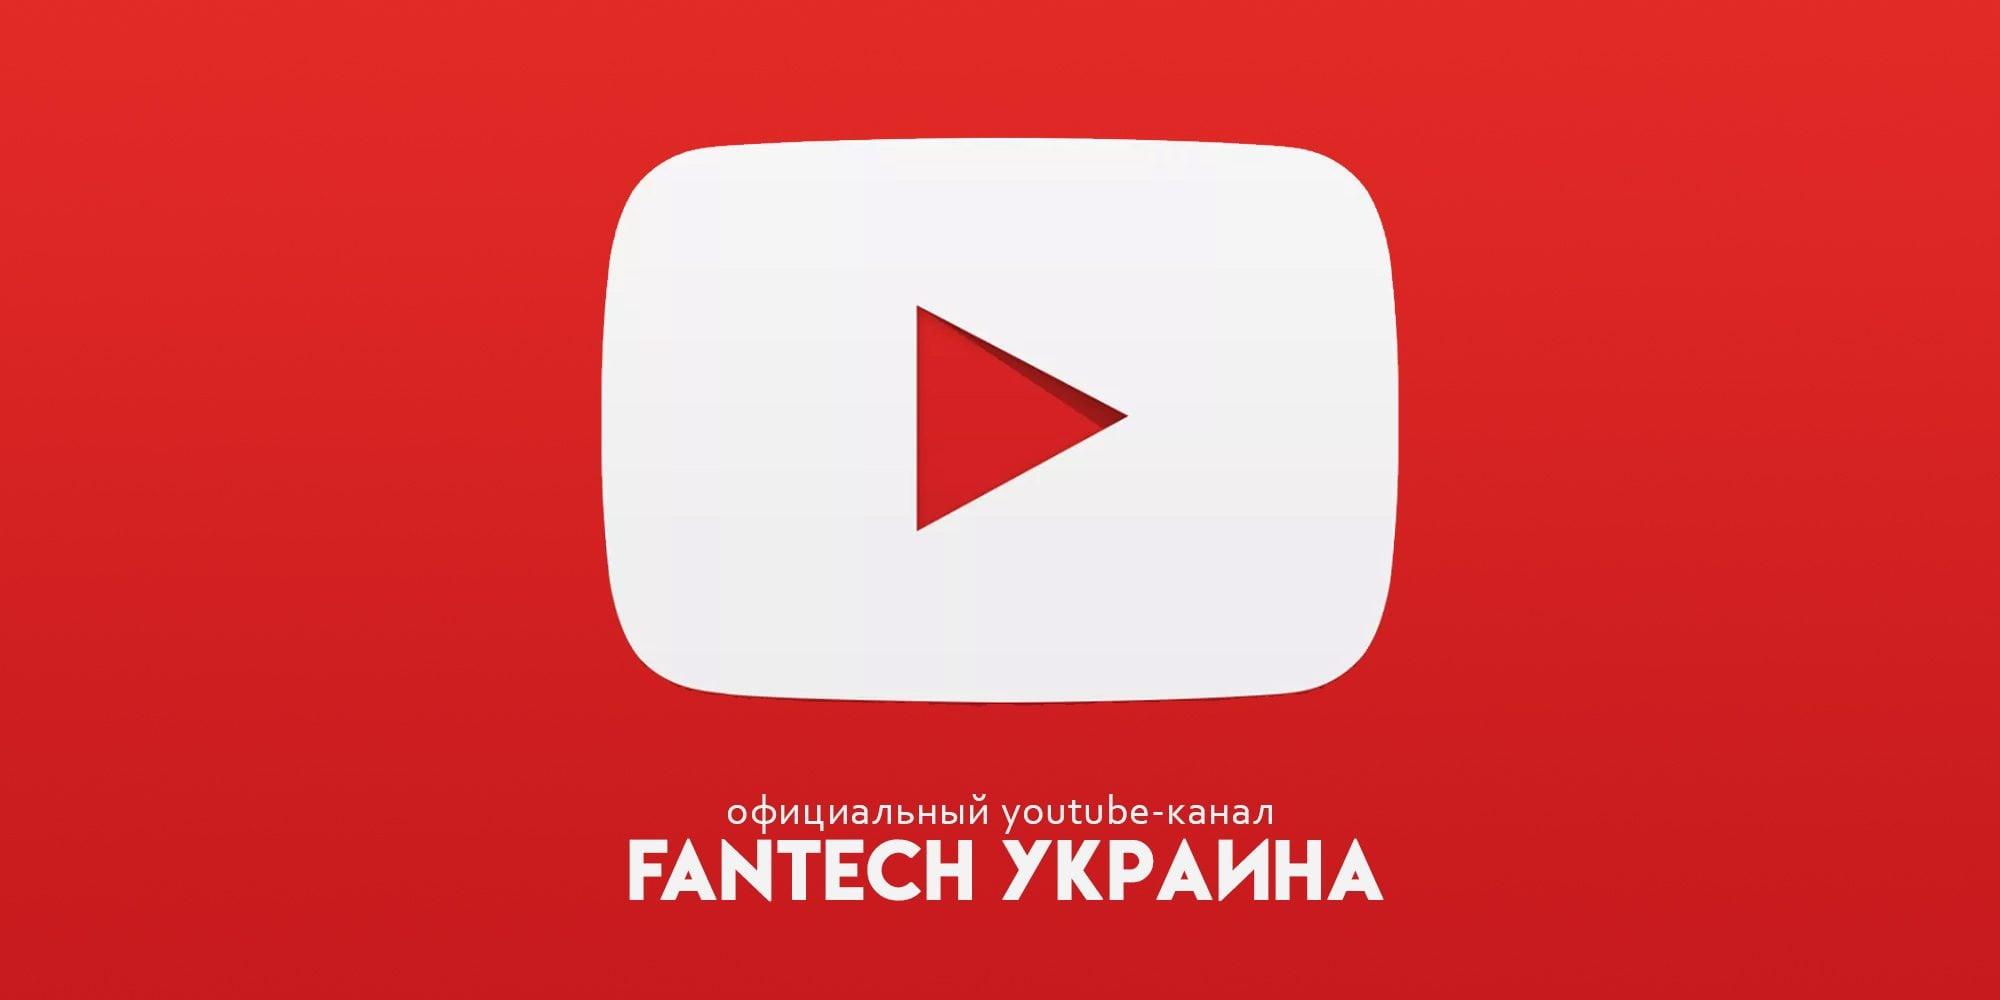 официальный youtube-канал Fantech Украина